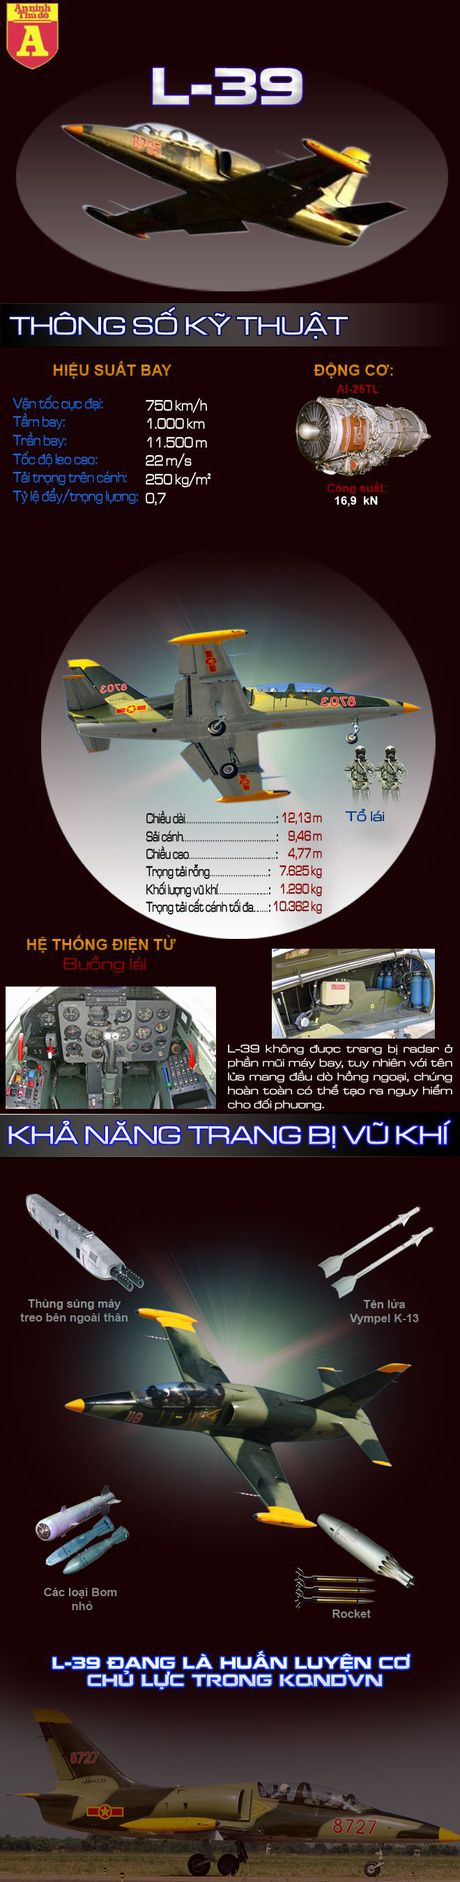 Suc manh cua chien dau co L-39 Viet Nam - Anh 2